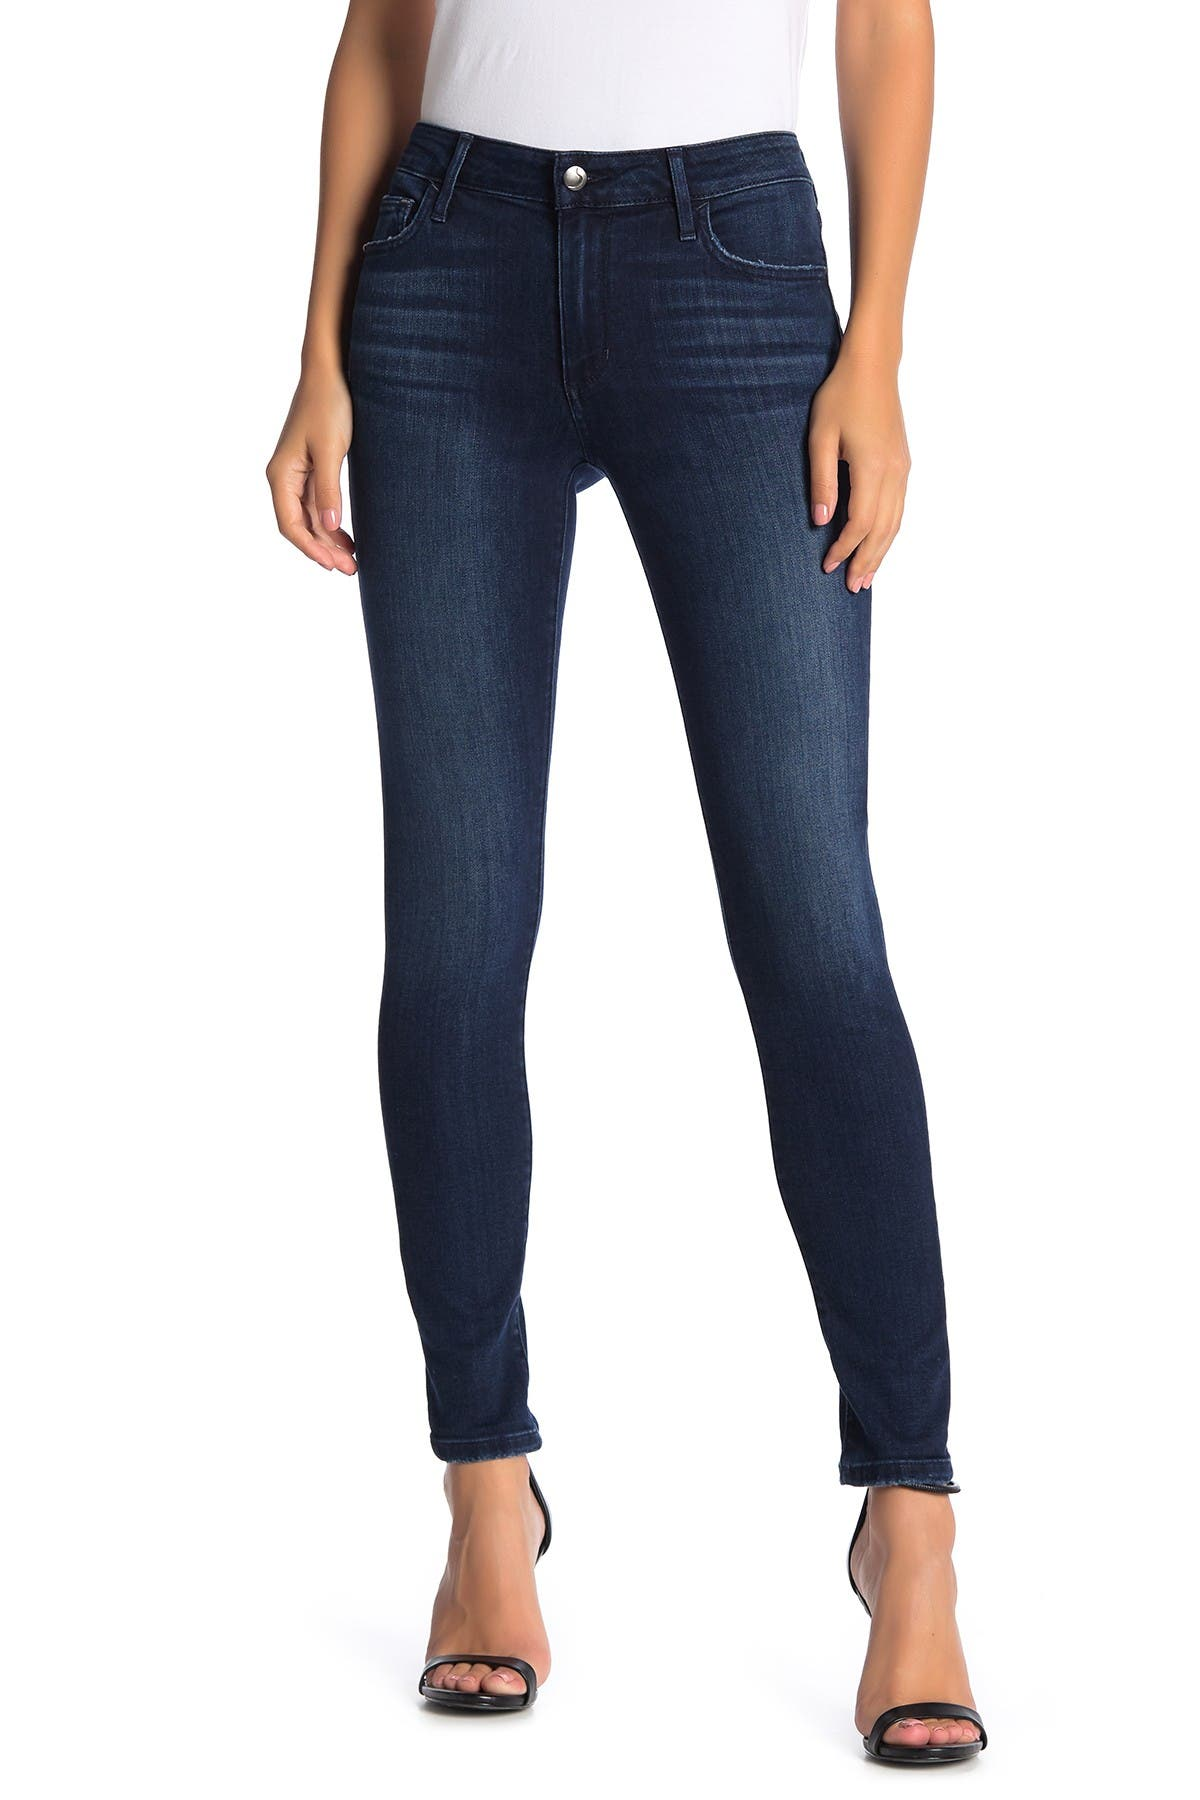 Image of Joe's Jeans Mid Rise Curvy Skinny Jeans